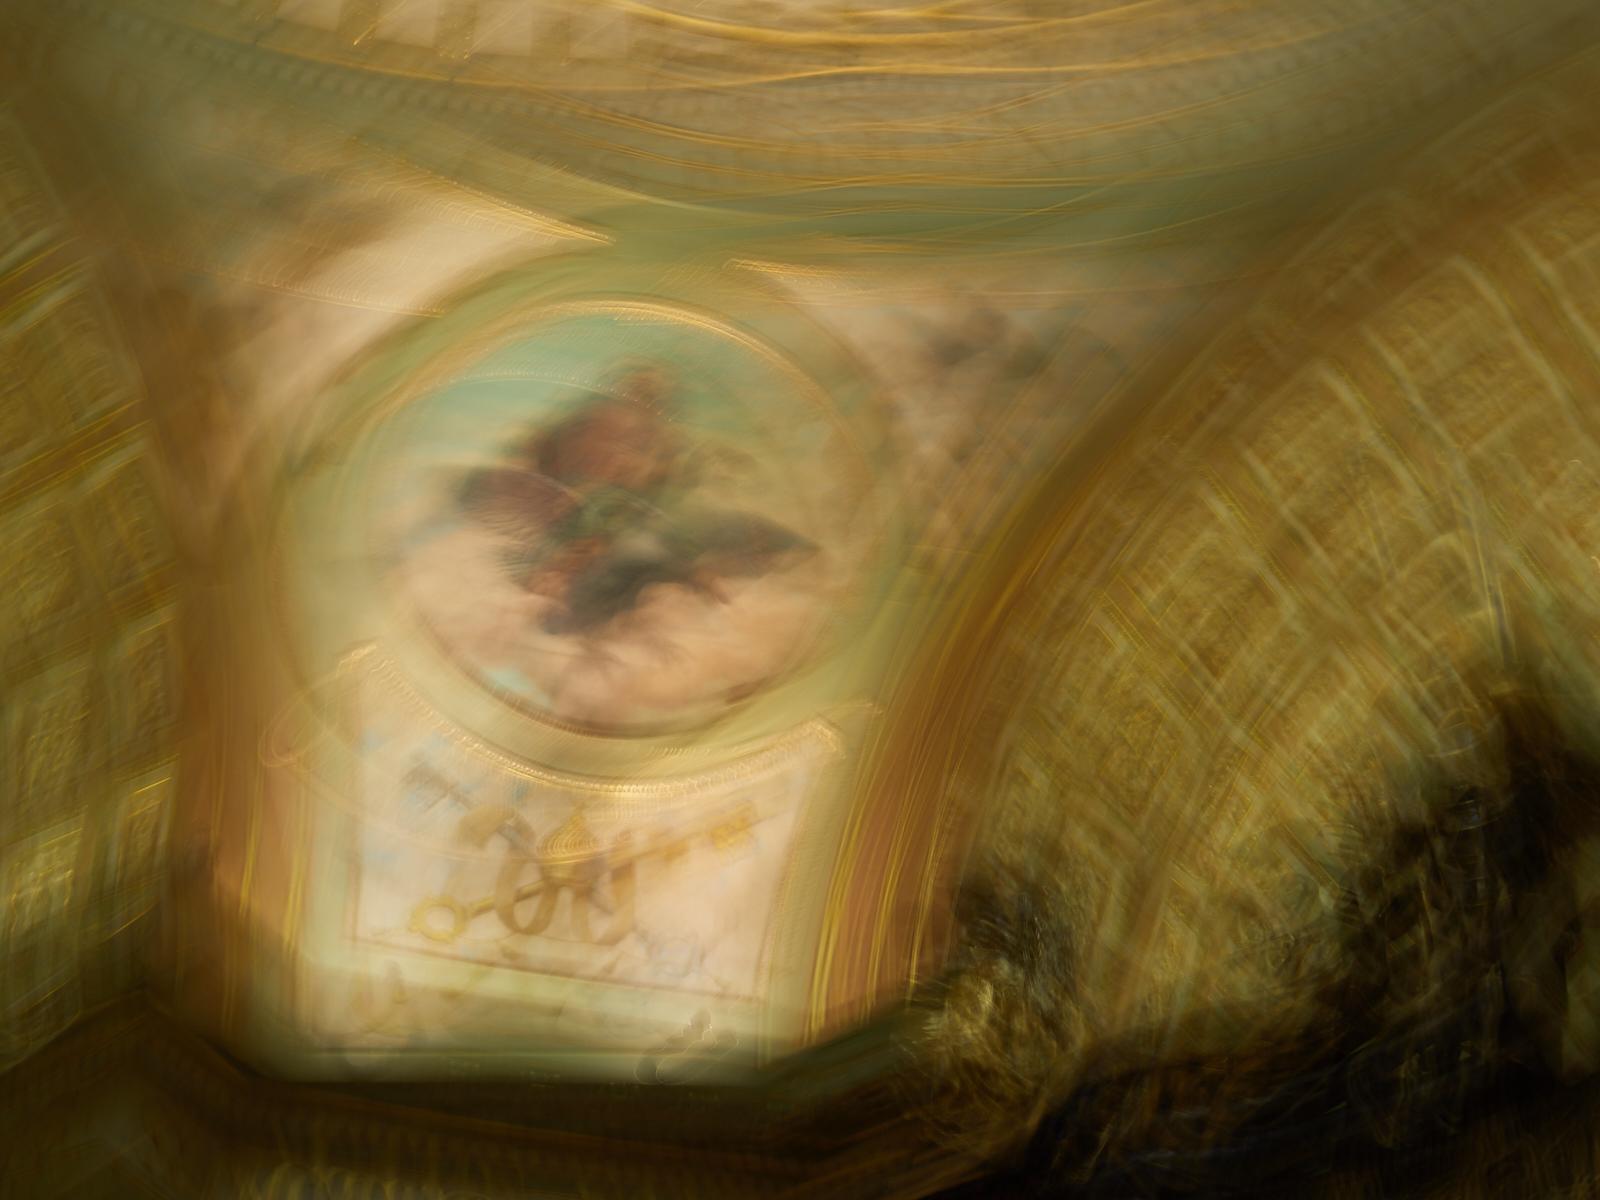 Montreal church ICM1600x1200 sRGB 1.jpg